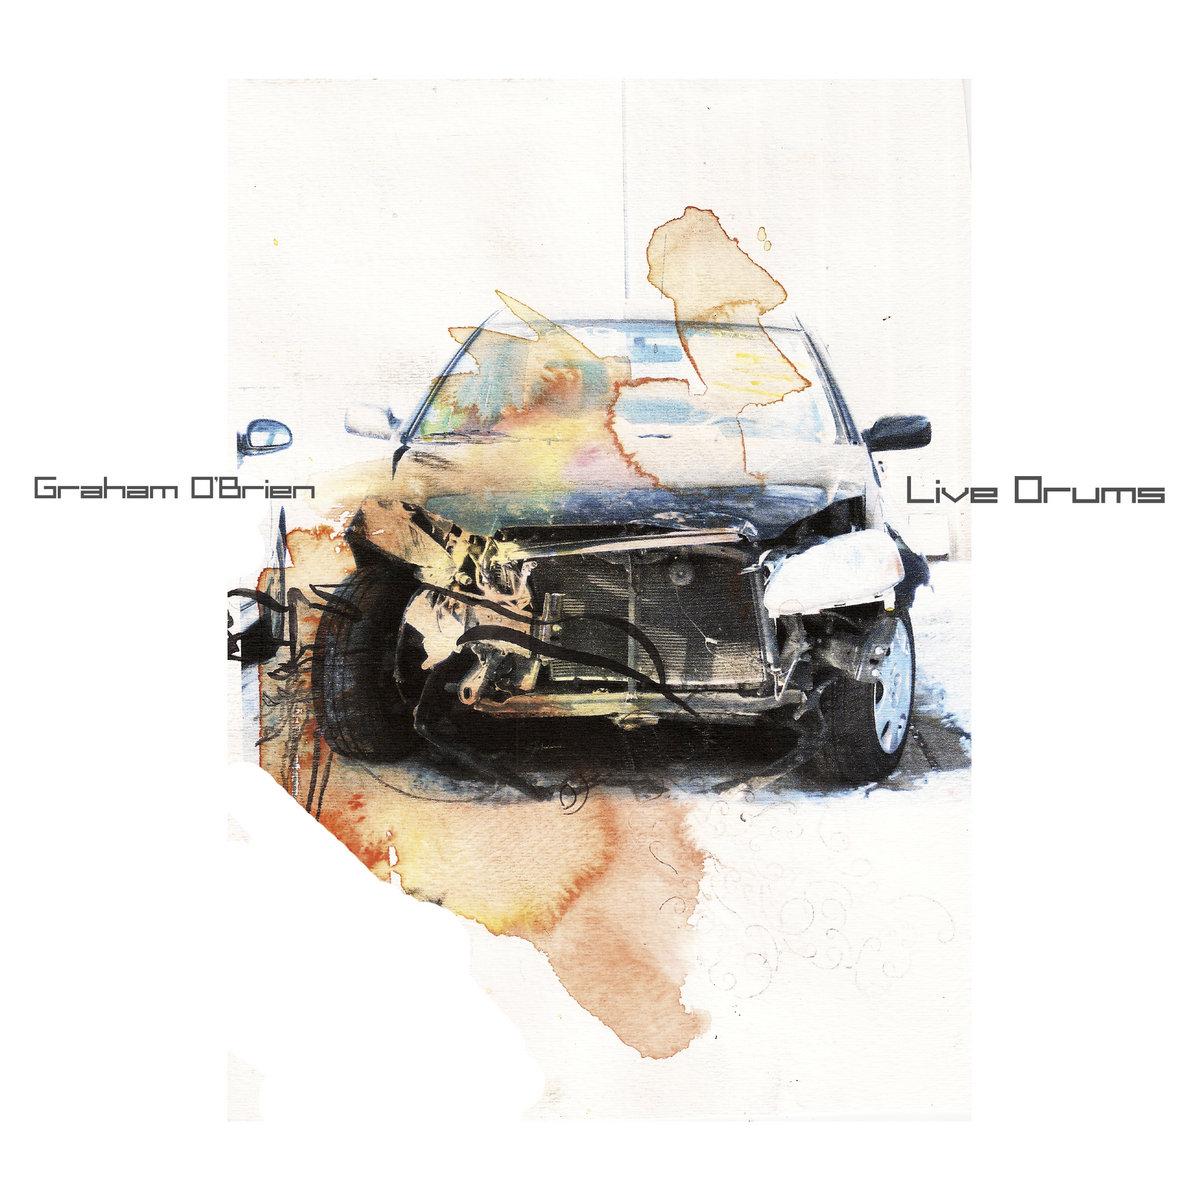 Graham Obrien-Live Drums-CD-FLAC-2010-FATHEAD Download